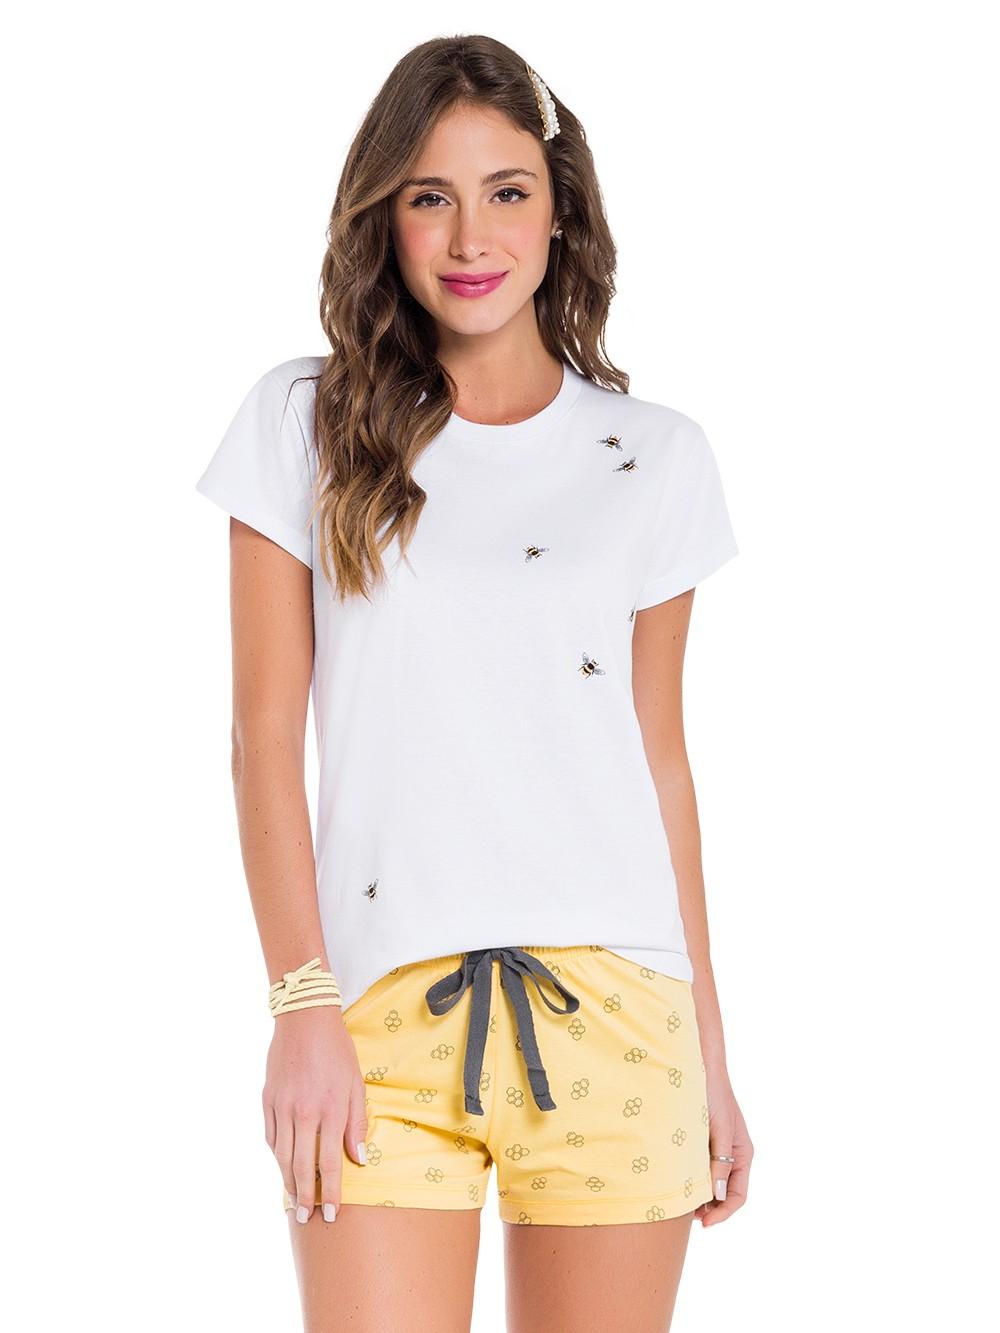 Pijama feminino curto blusa manga curta short abelinha mãe